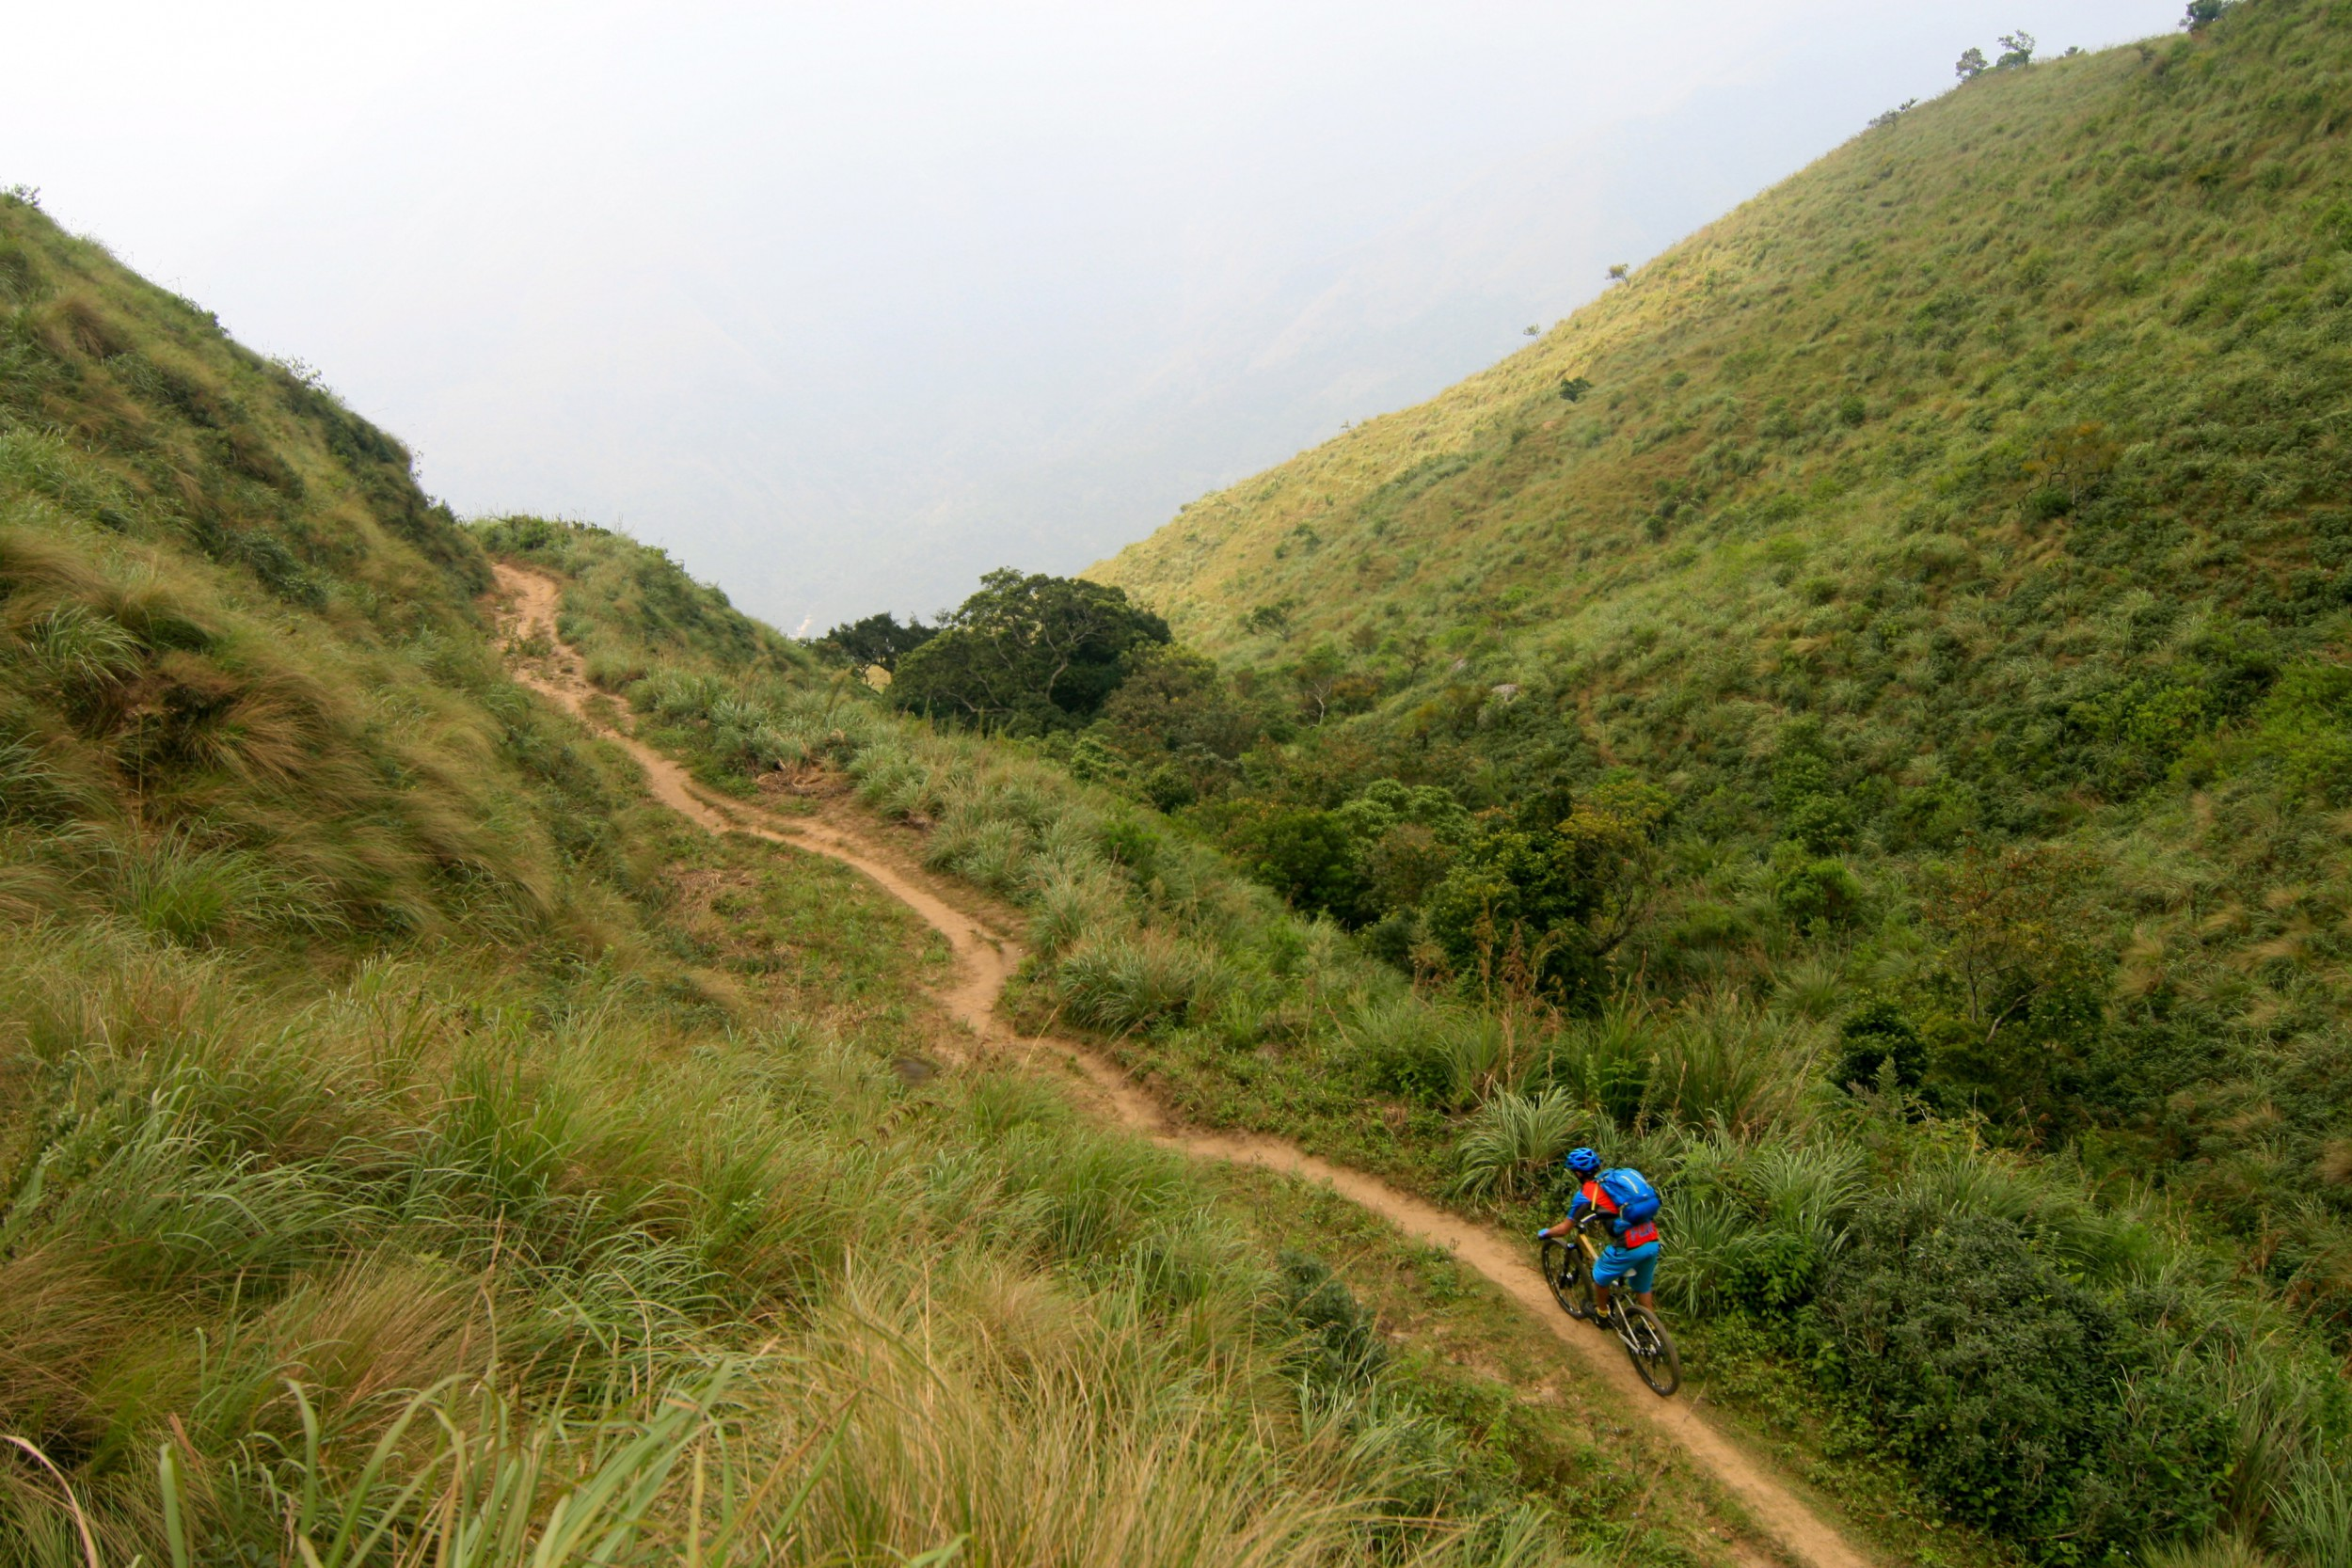 Mountain bike Kerala India 10 day program - Pathfinder Travels